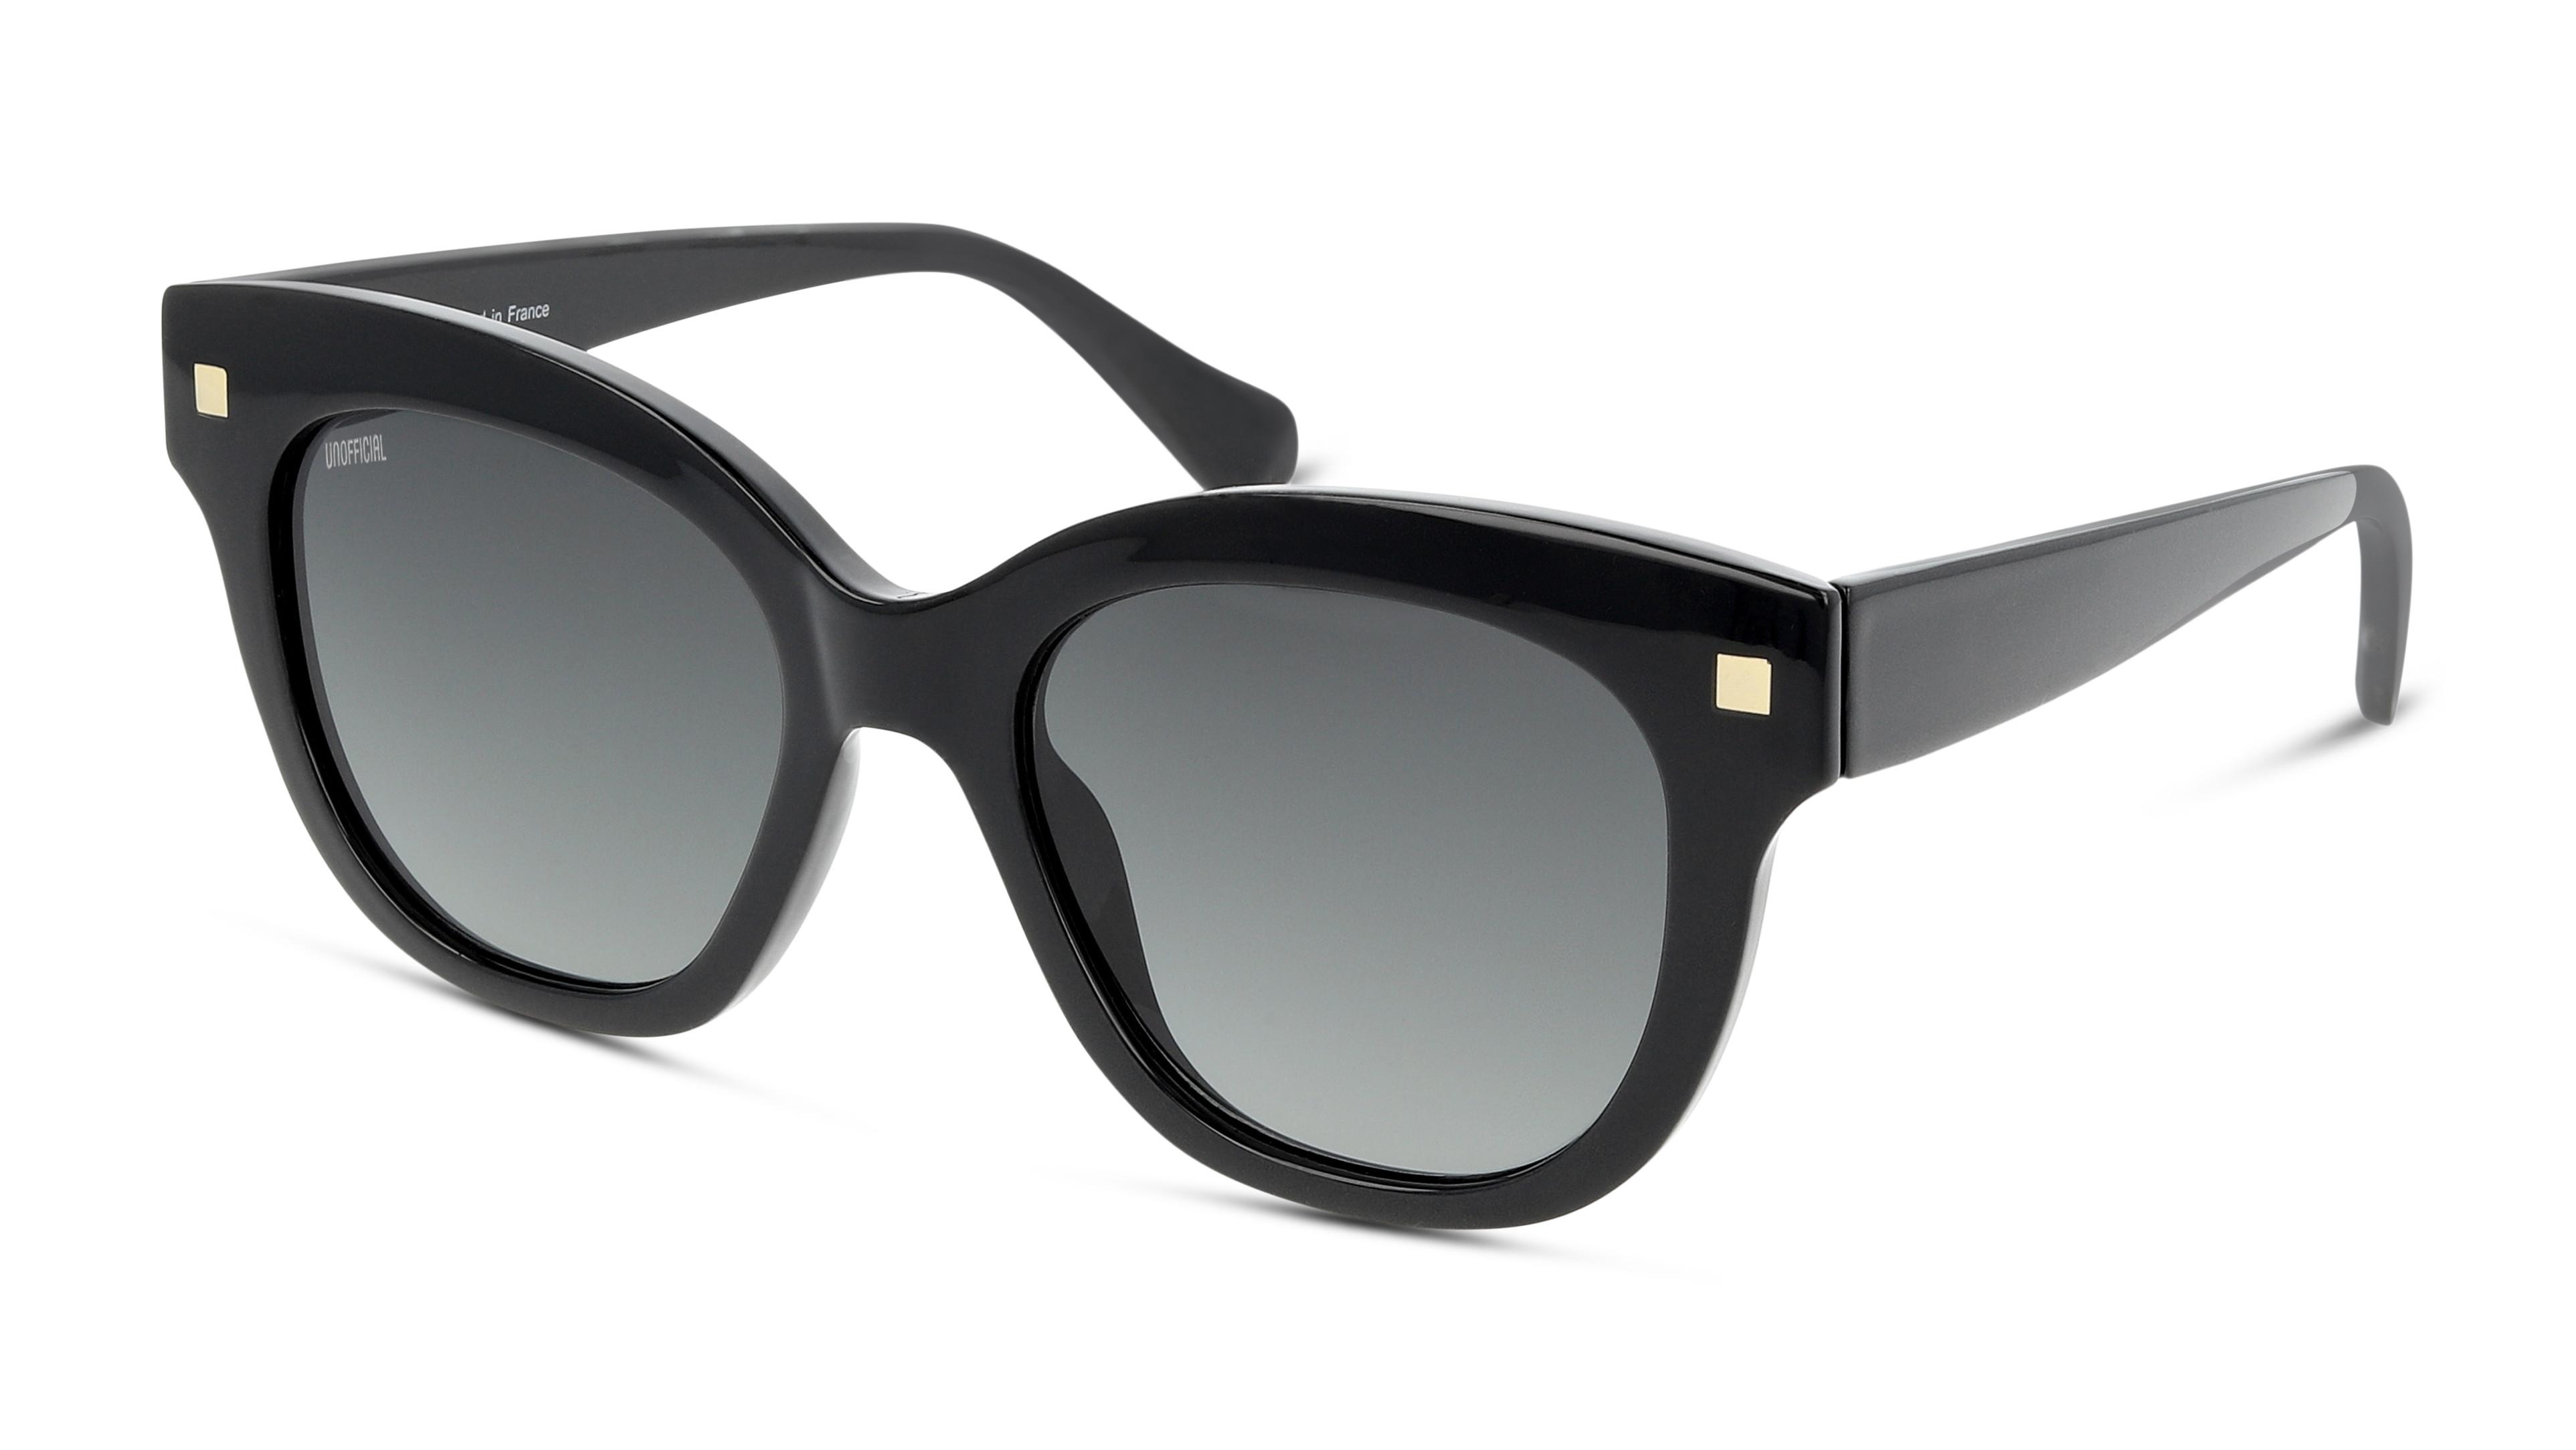 8719154751943-angle-03-unofficial-unsf0071-eyewear-black-black